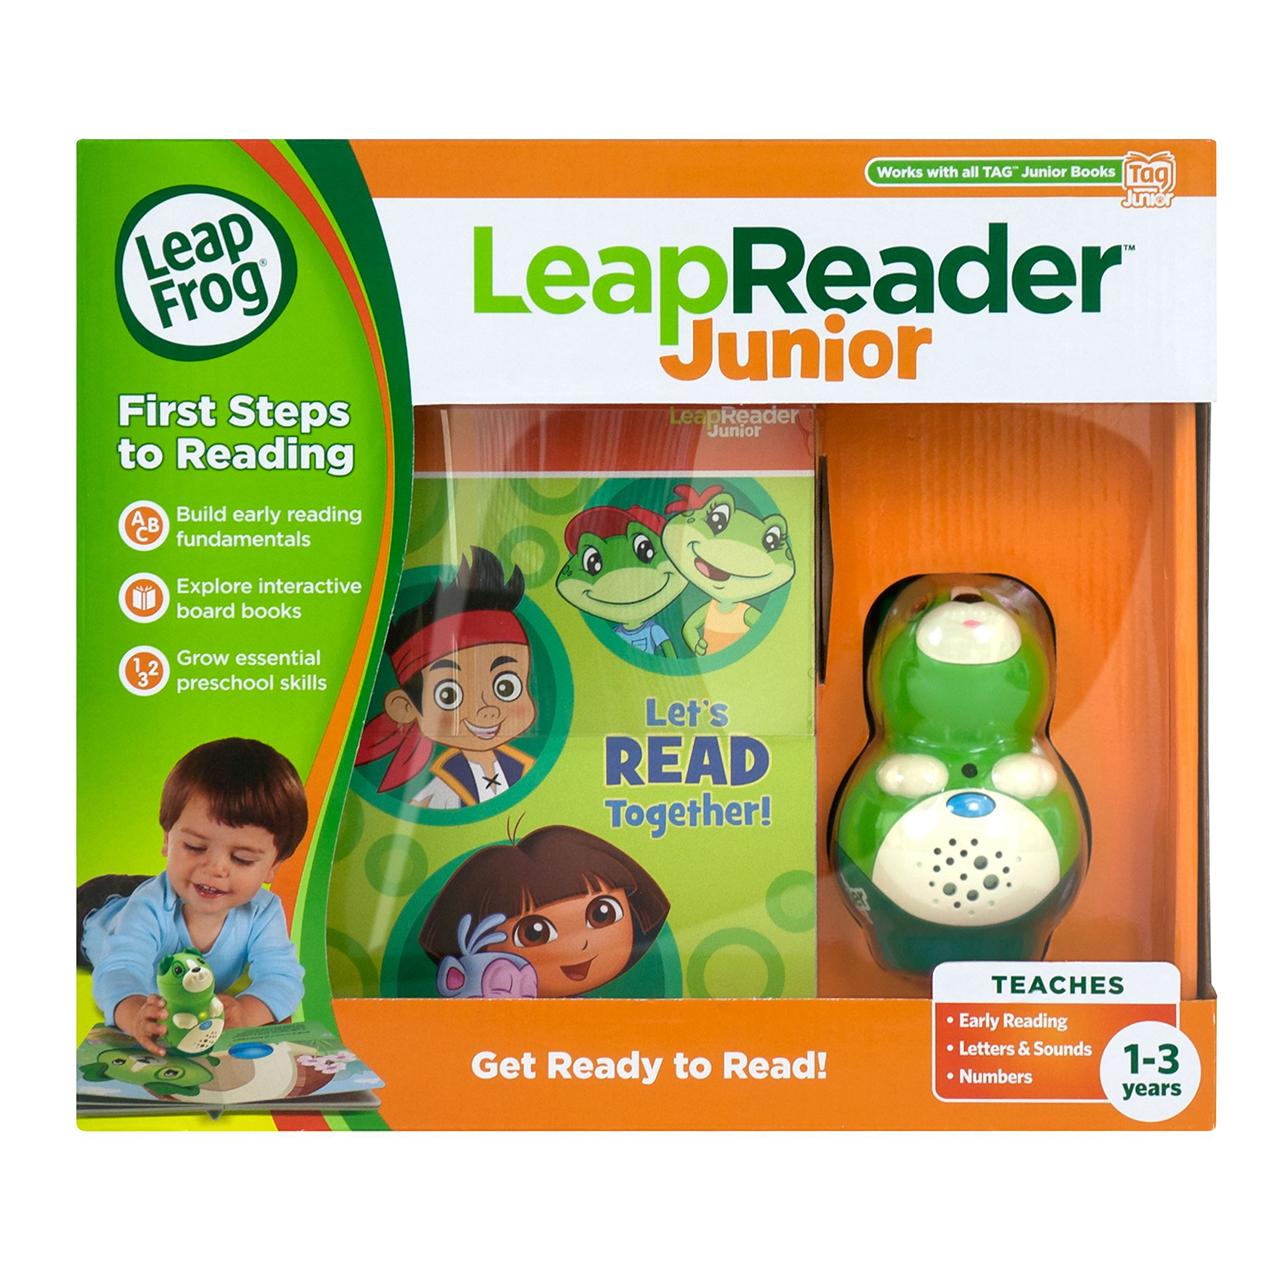 Leapfrog coupons uk